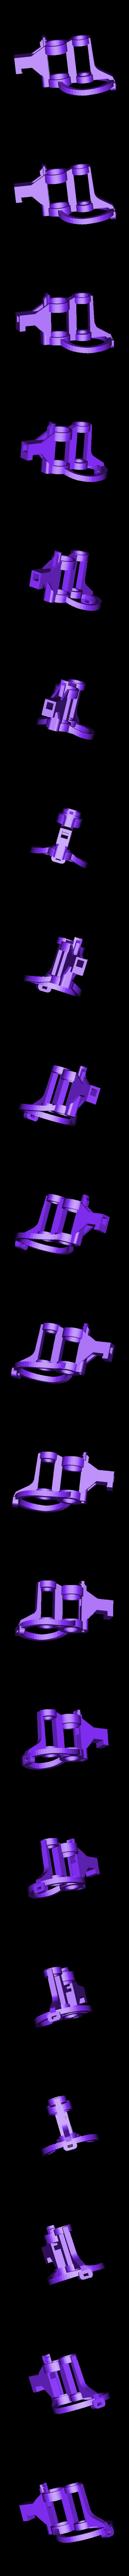 rotor_case.stl Download free STL file Mini FPV quad copter kit for V929 or HK Q-bot • Design to 3D print, 3dxl